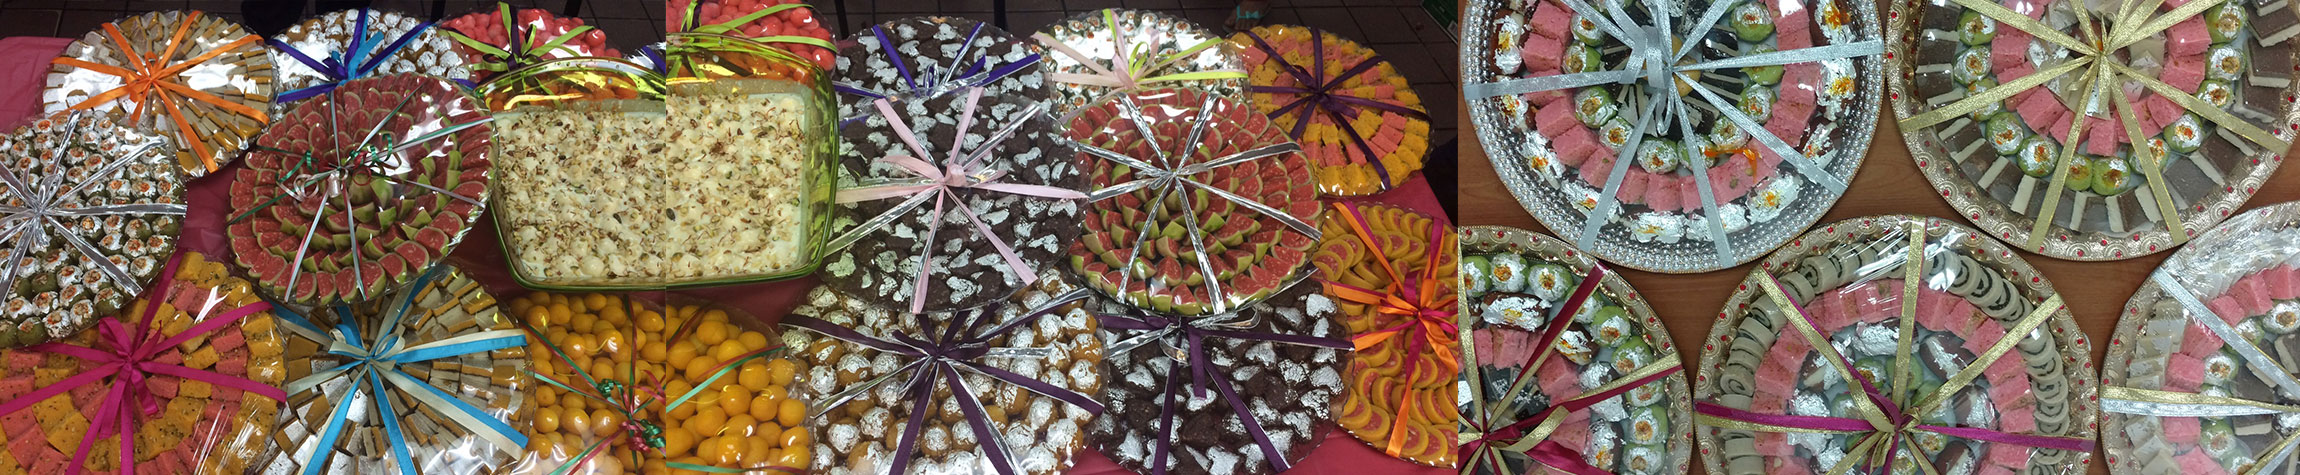 Sweets Platter Samples